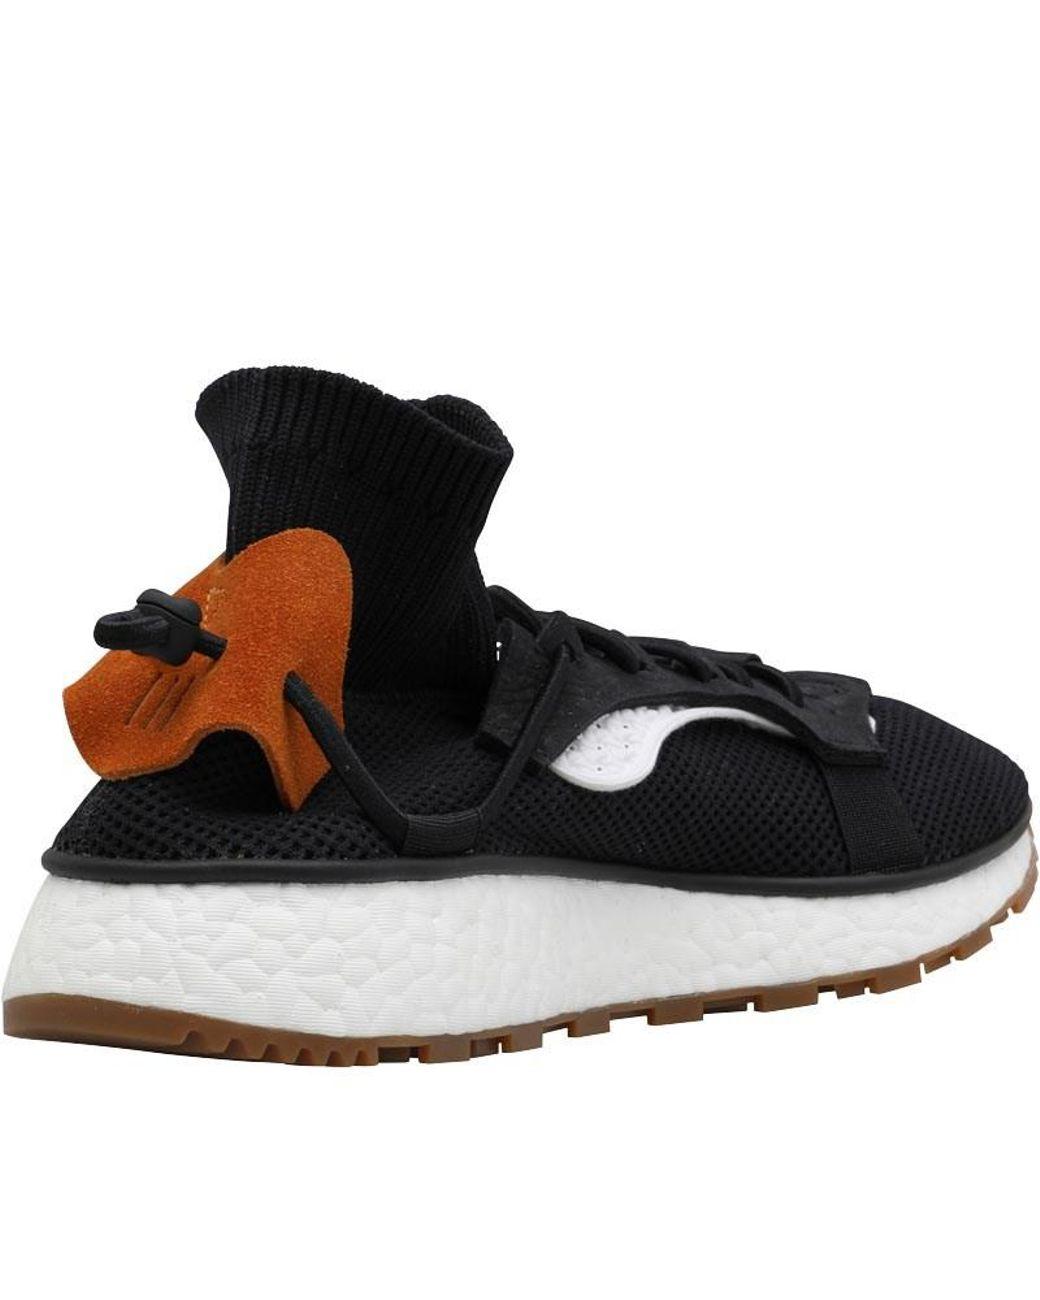 Adidas Alexander Wang Run Herren Core BlackGum CM7825 Schuhe